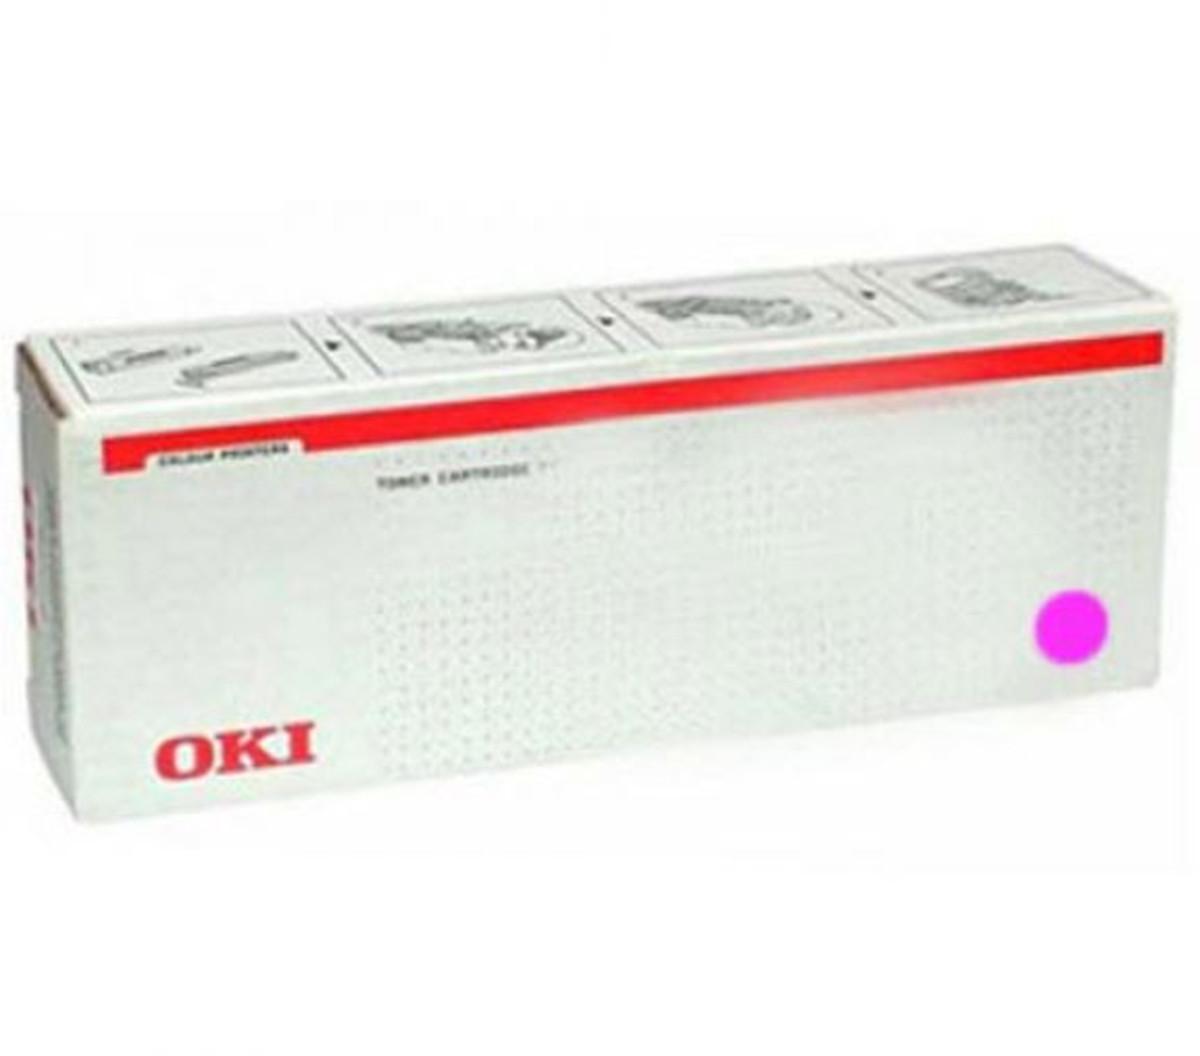 Oki 44844526 Magenta Toner Cartridge